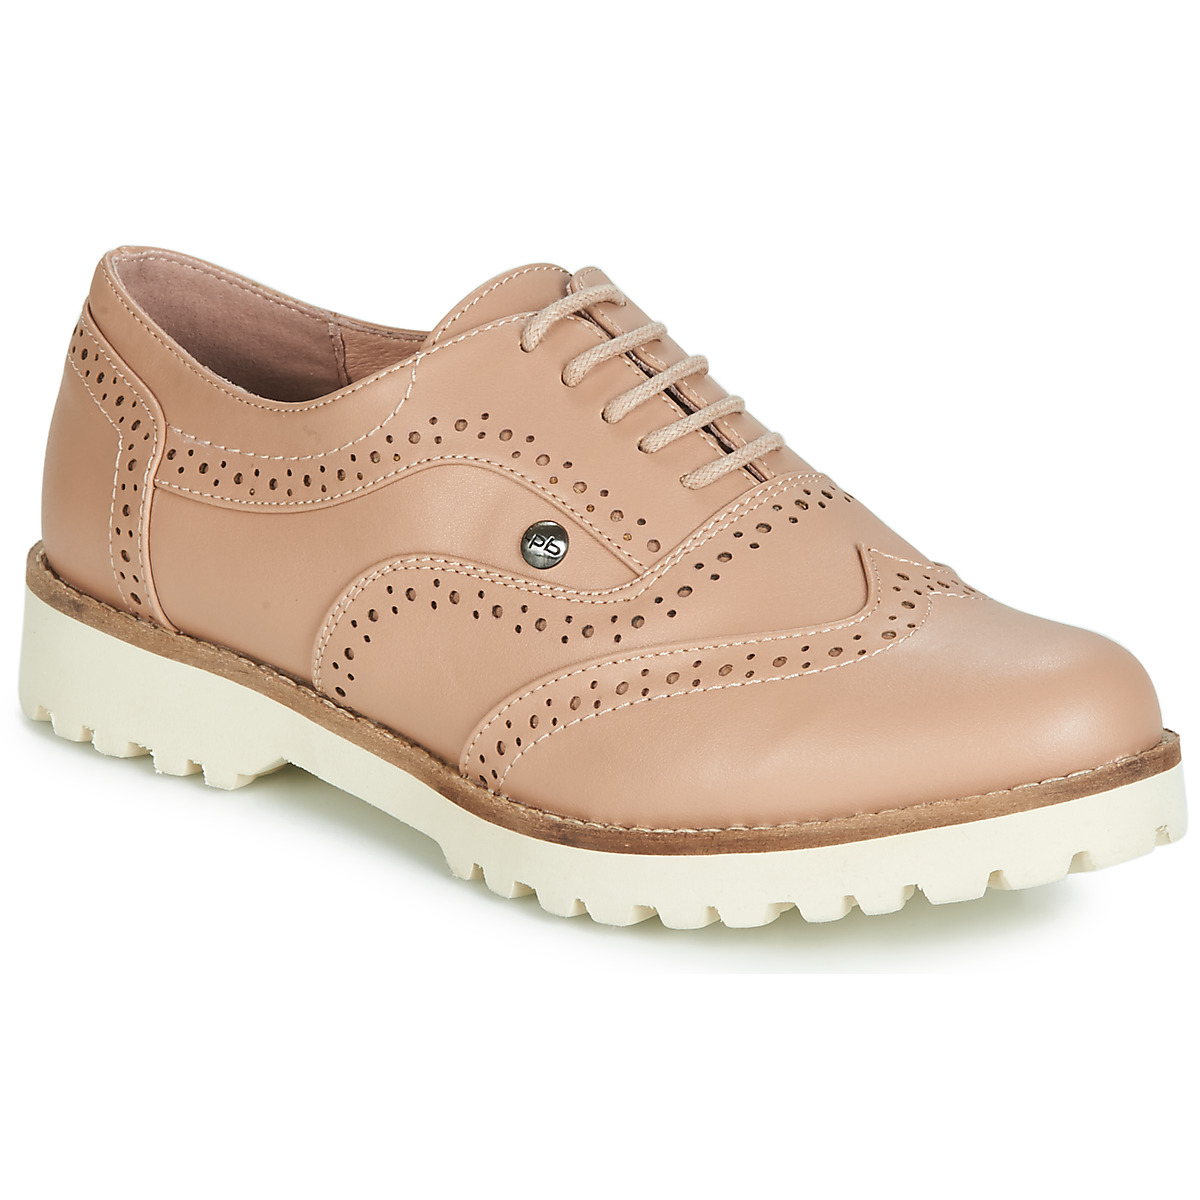 Sko LPB Shoes  GISELE